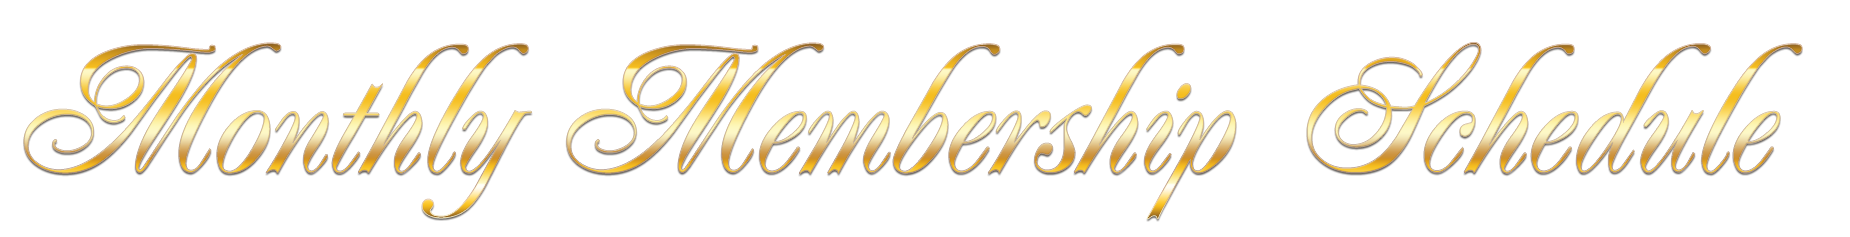 Monthly Membership Schedule